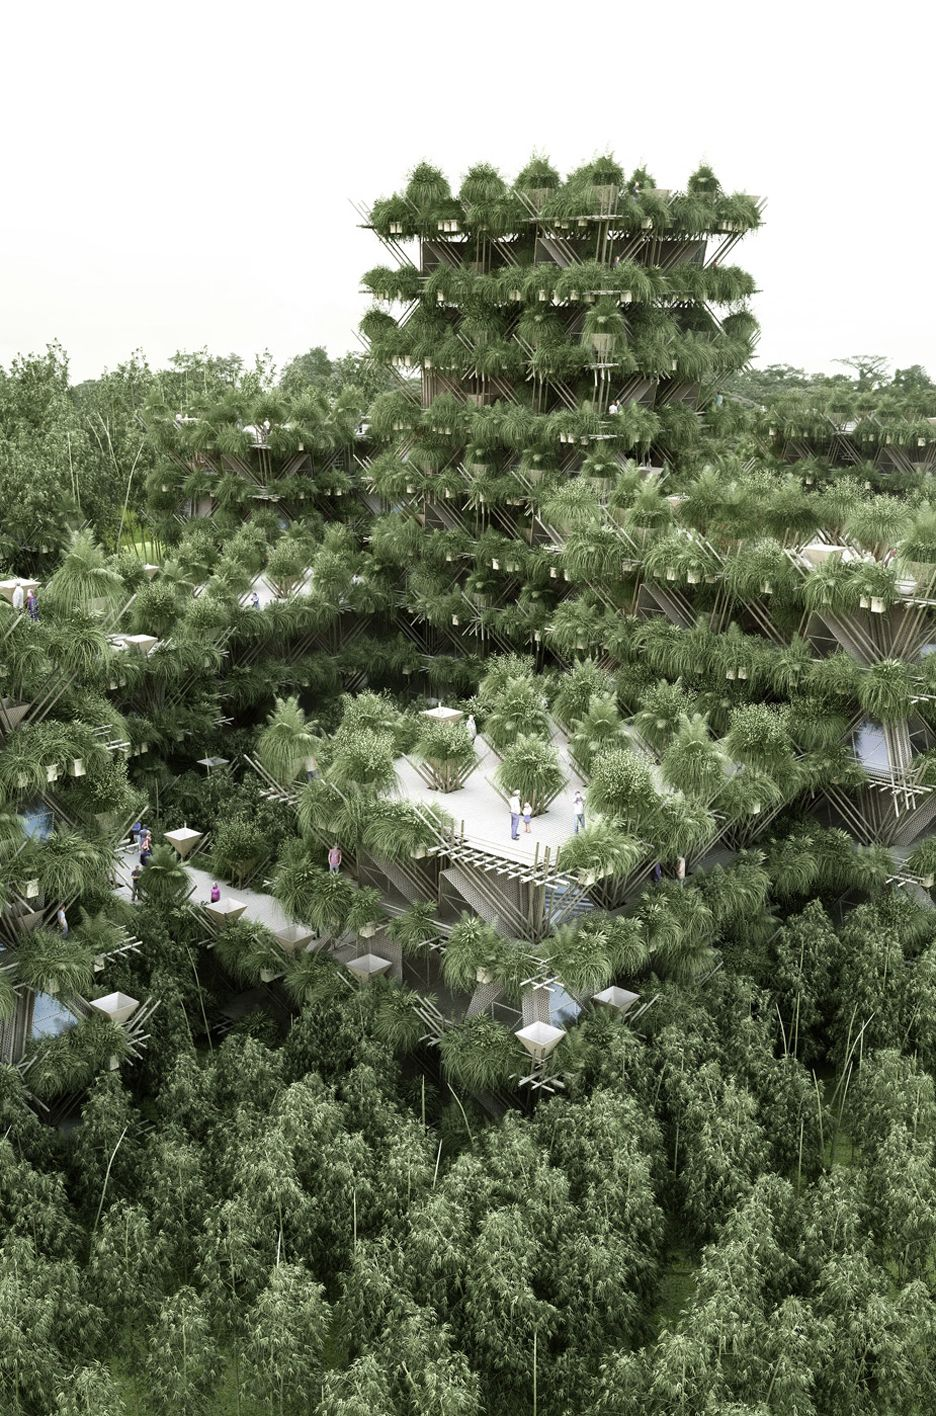 Penda Future Vision for Rising Canes, Beijing Design Week 2015